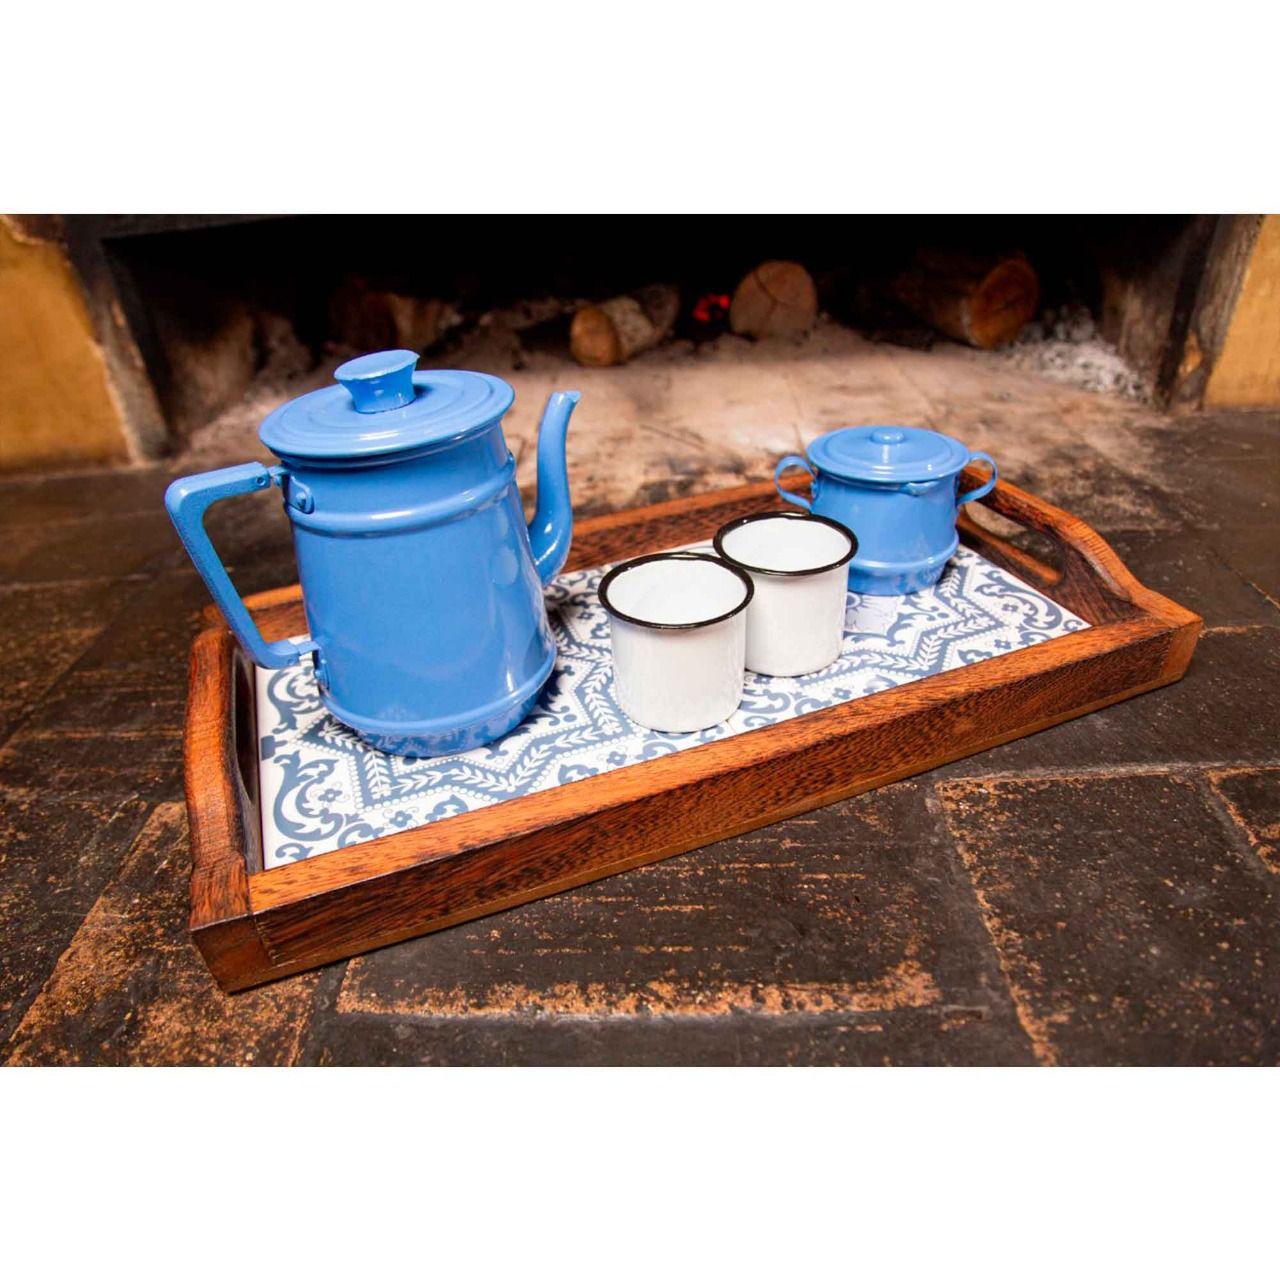 Kit bandeja, bule 1 litro azul claro e canecas brancas e açucareiro azul claro